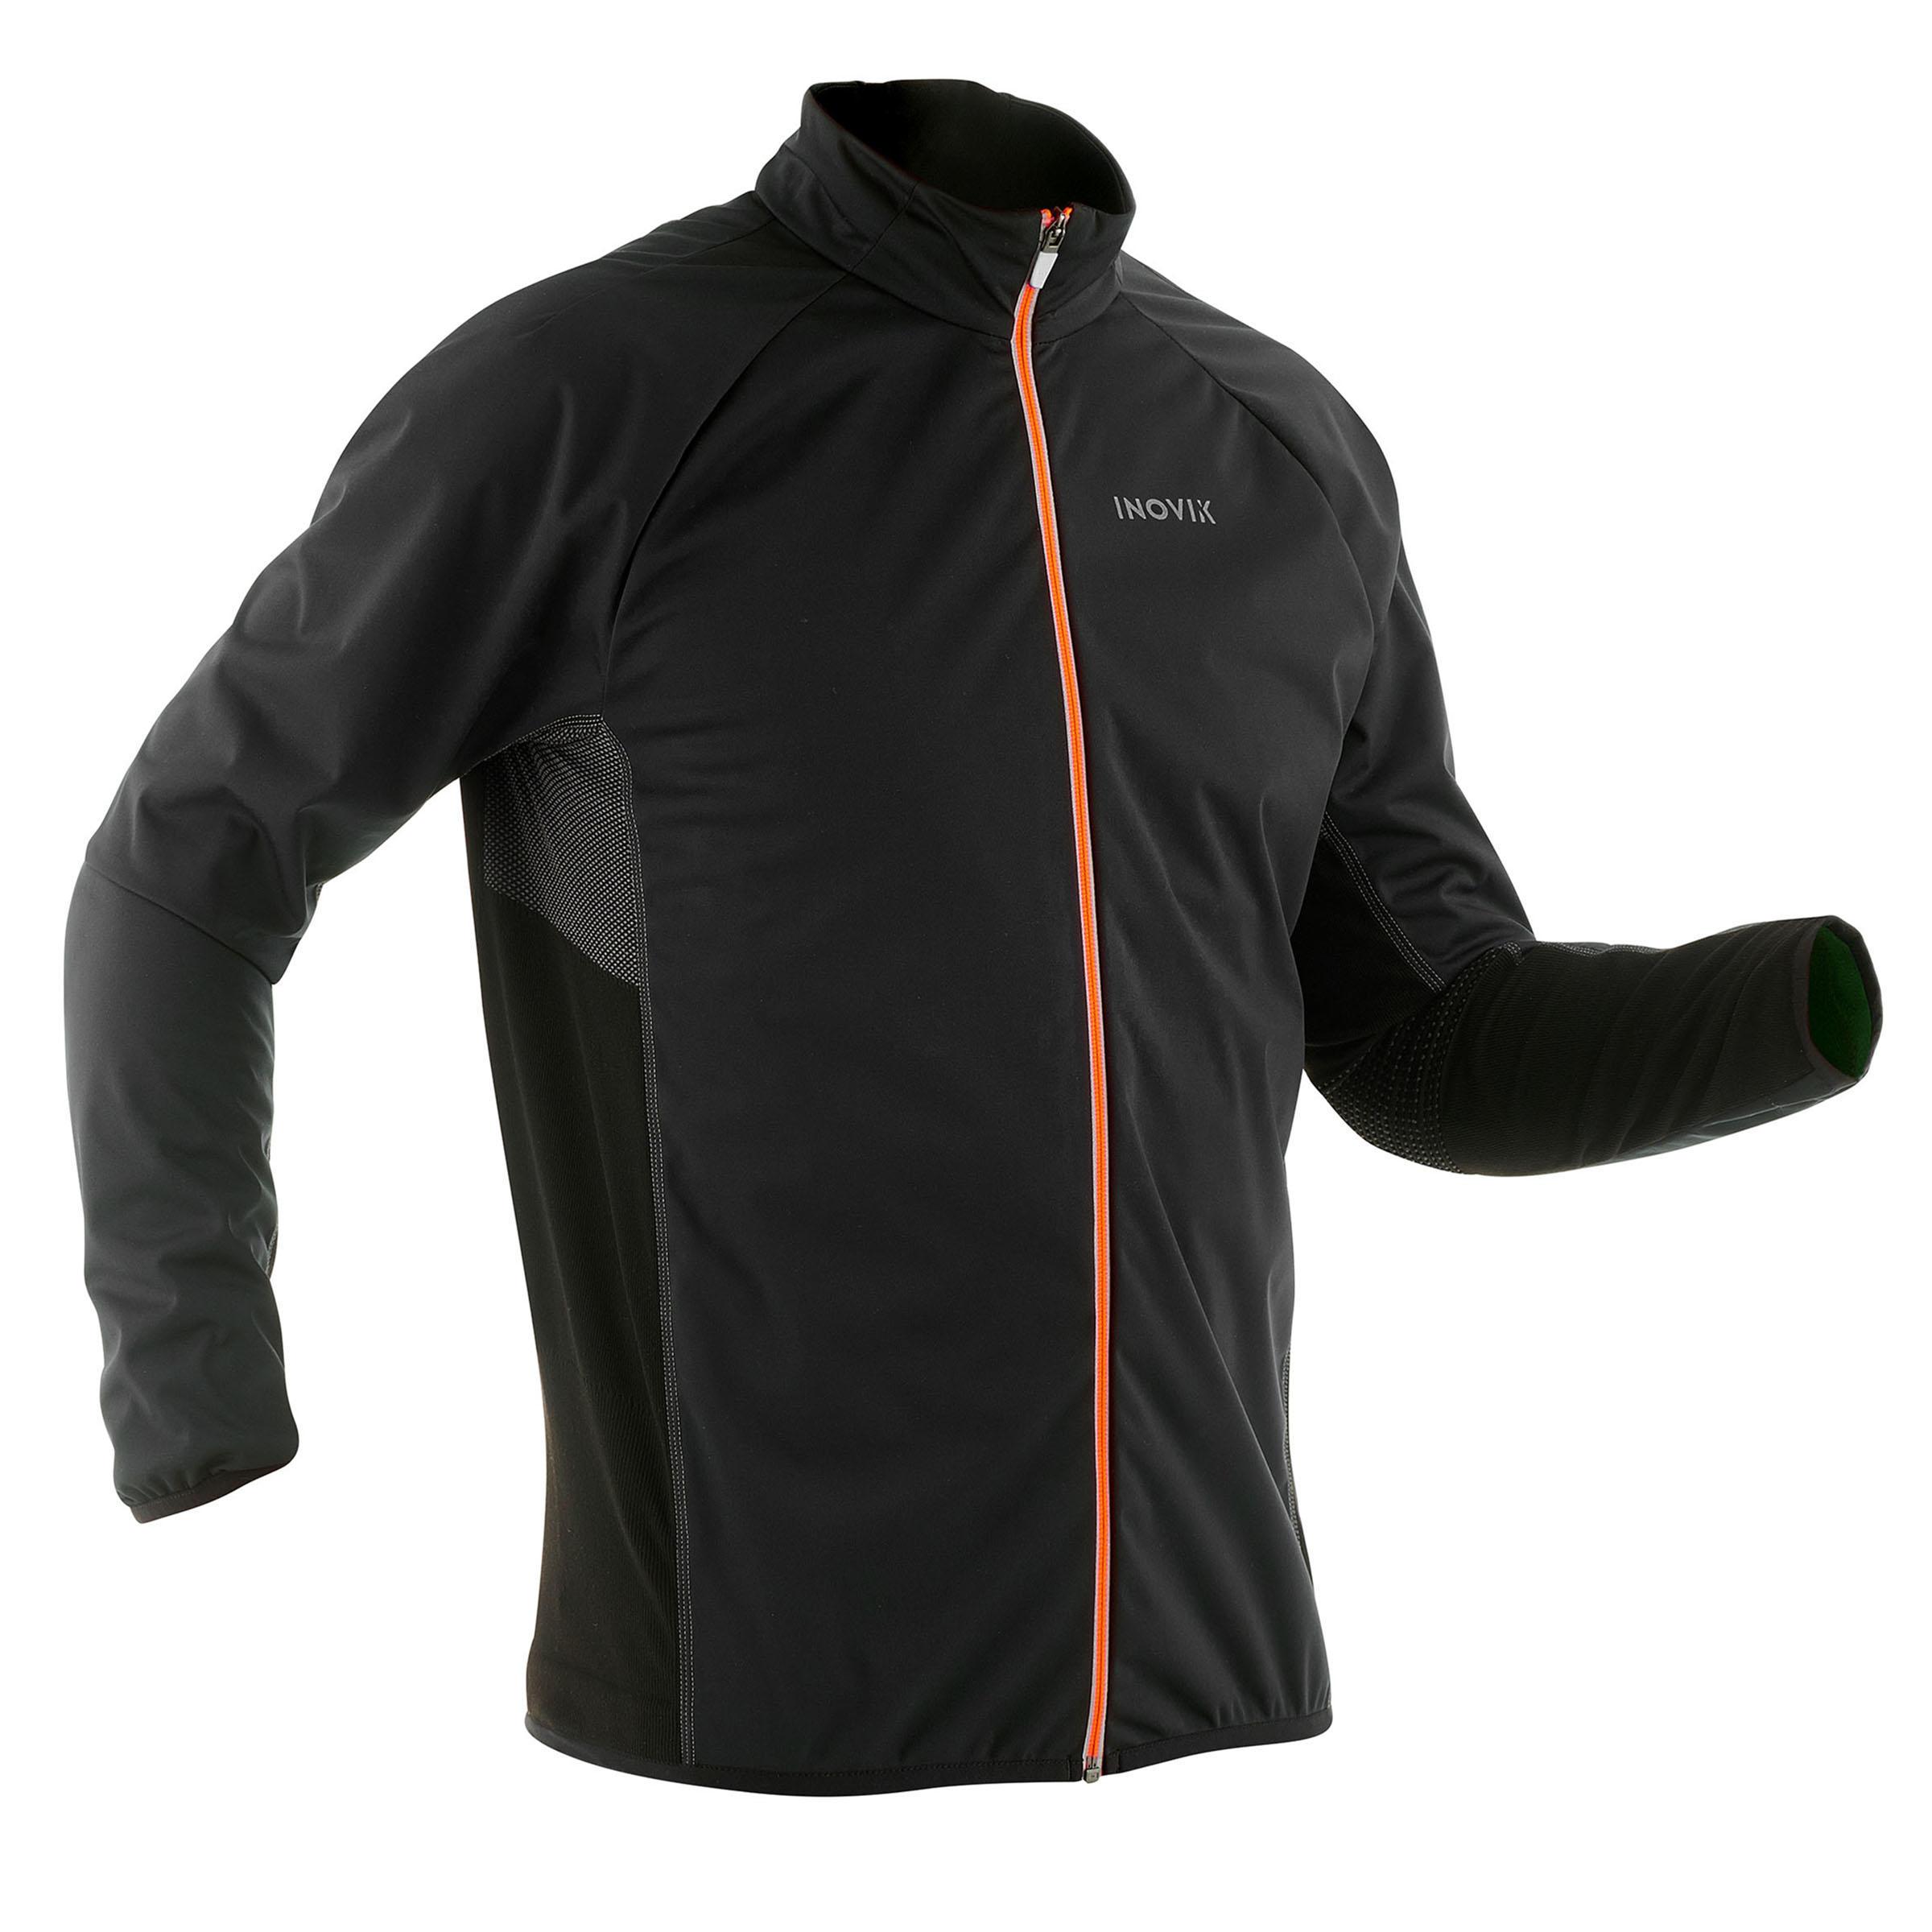 Langlaufjacke XC S Jacket 900 Herren schwarz | Sportbekleidung > Sportjacken > Laufjacken | Inovik